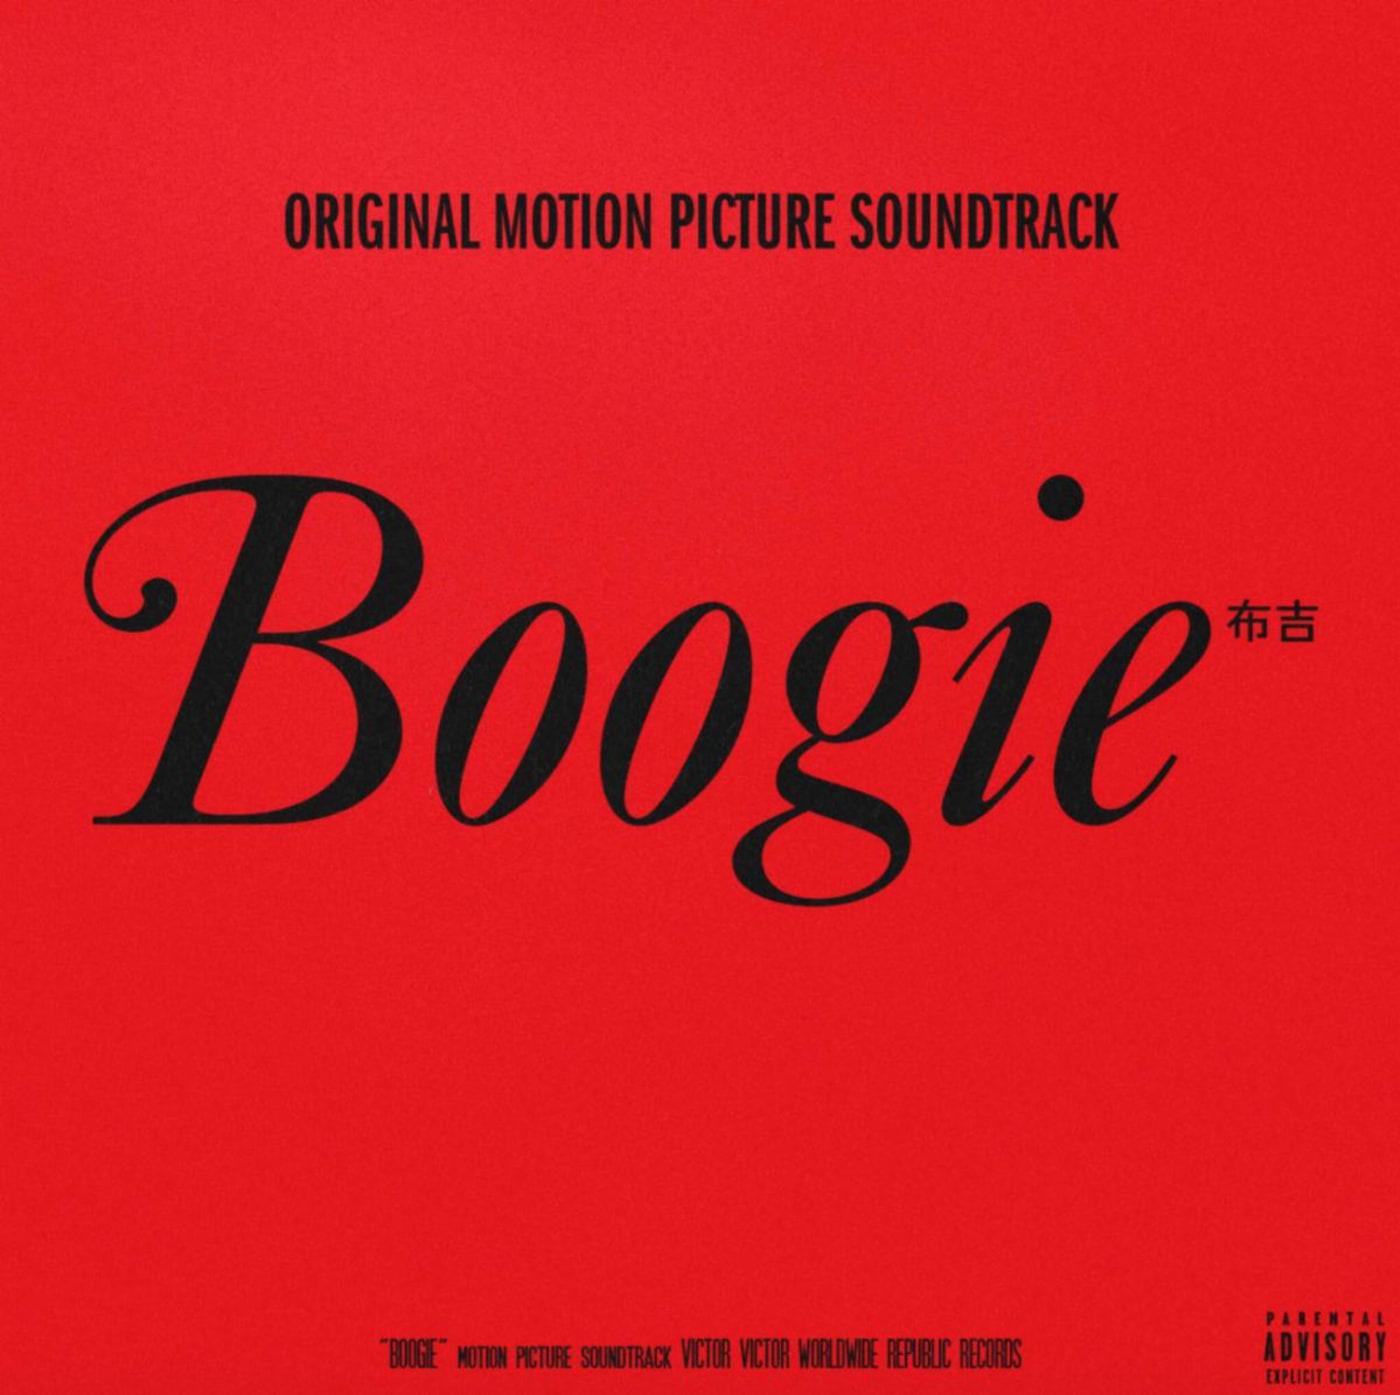 'Boogie' Soundtrack